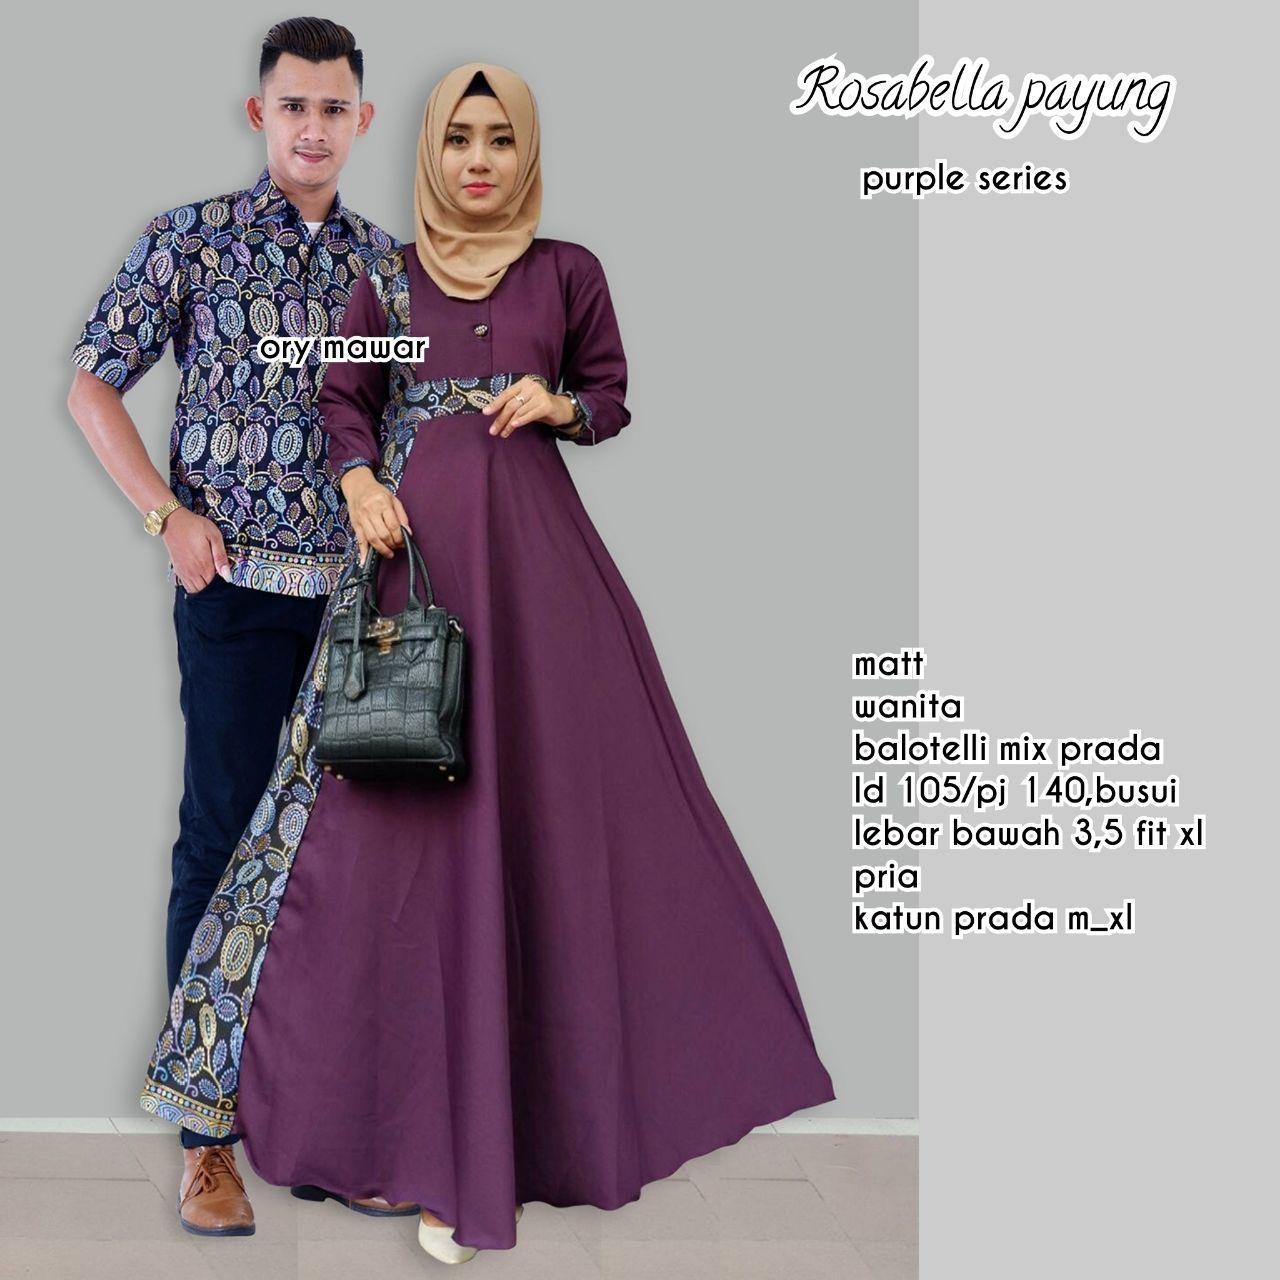 TERMURAH - Batik Couple / Couple Batik / Batik Sarimbit / Baju Batik Modern / Batik Kondangan / Baju Batik ROSABELLA UNGU